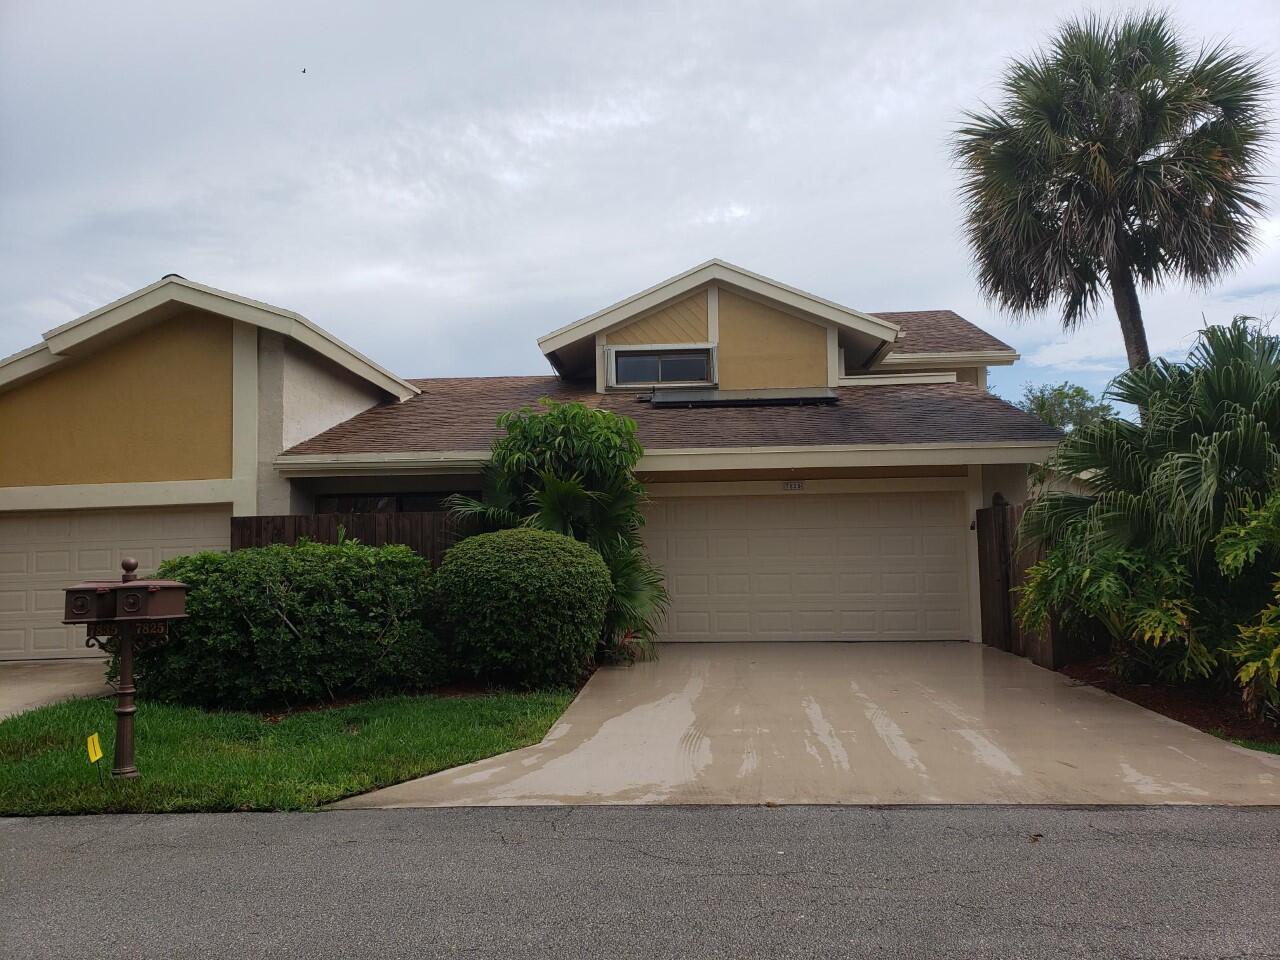 7825 Stanway, Boca Raton, Florida 33433